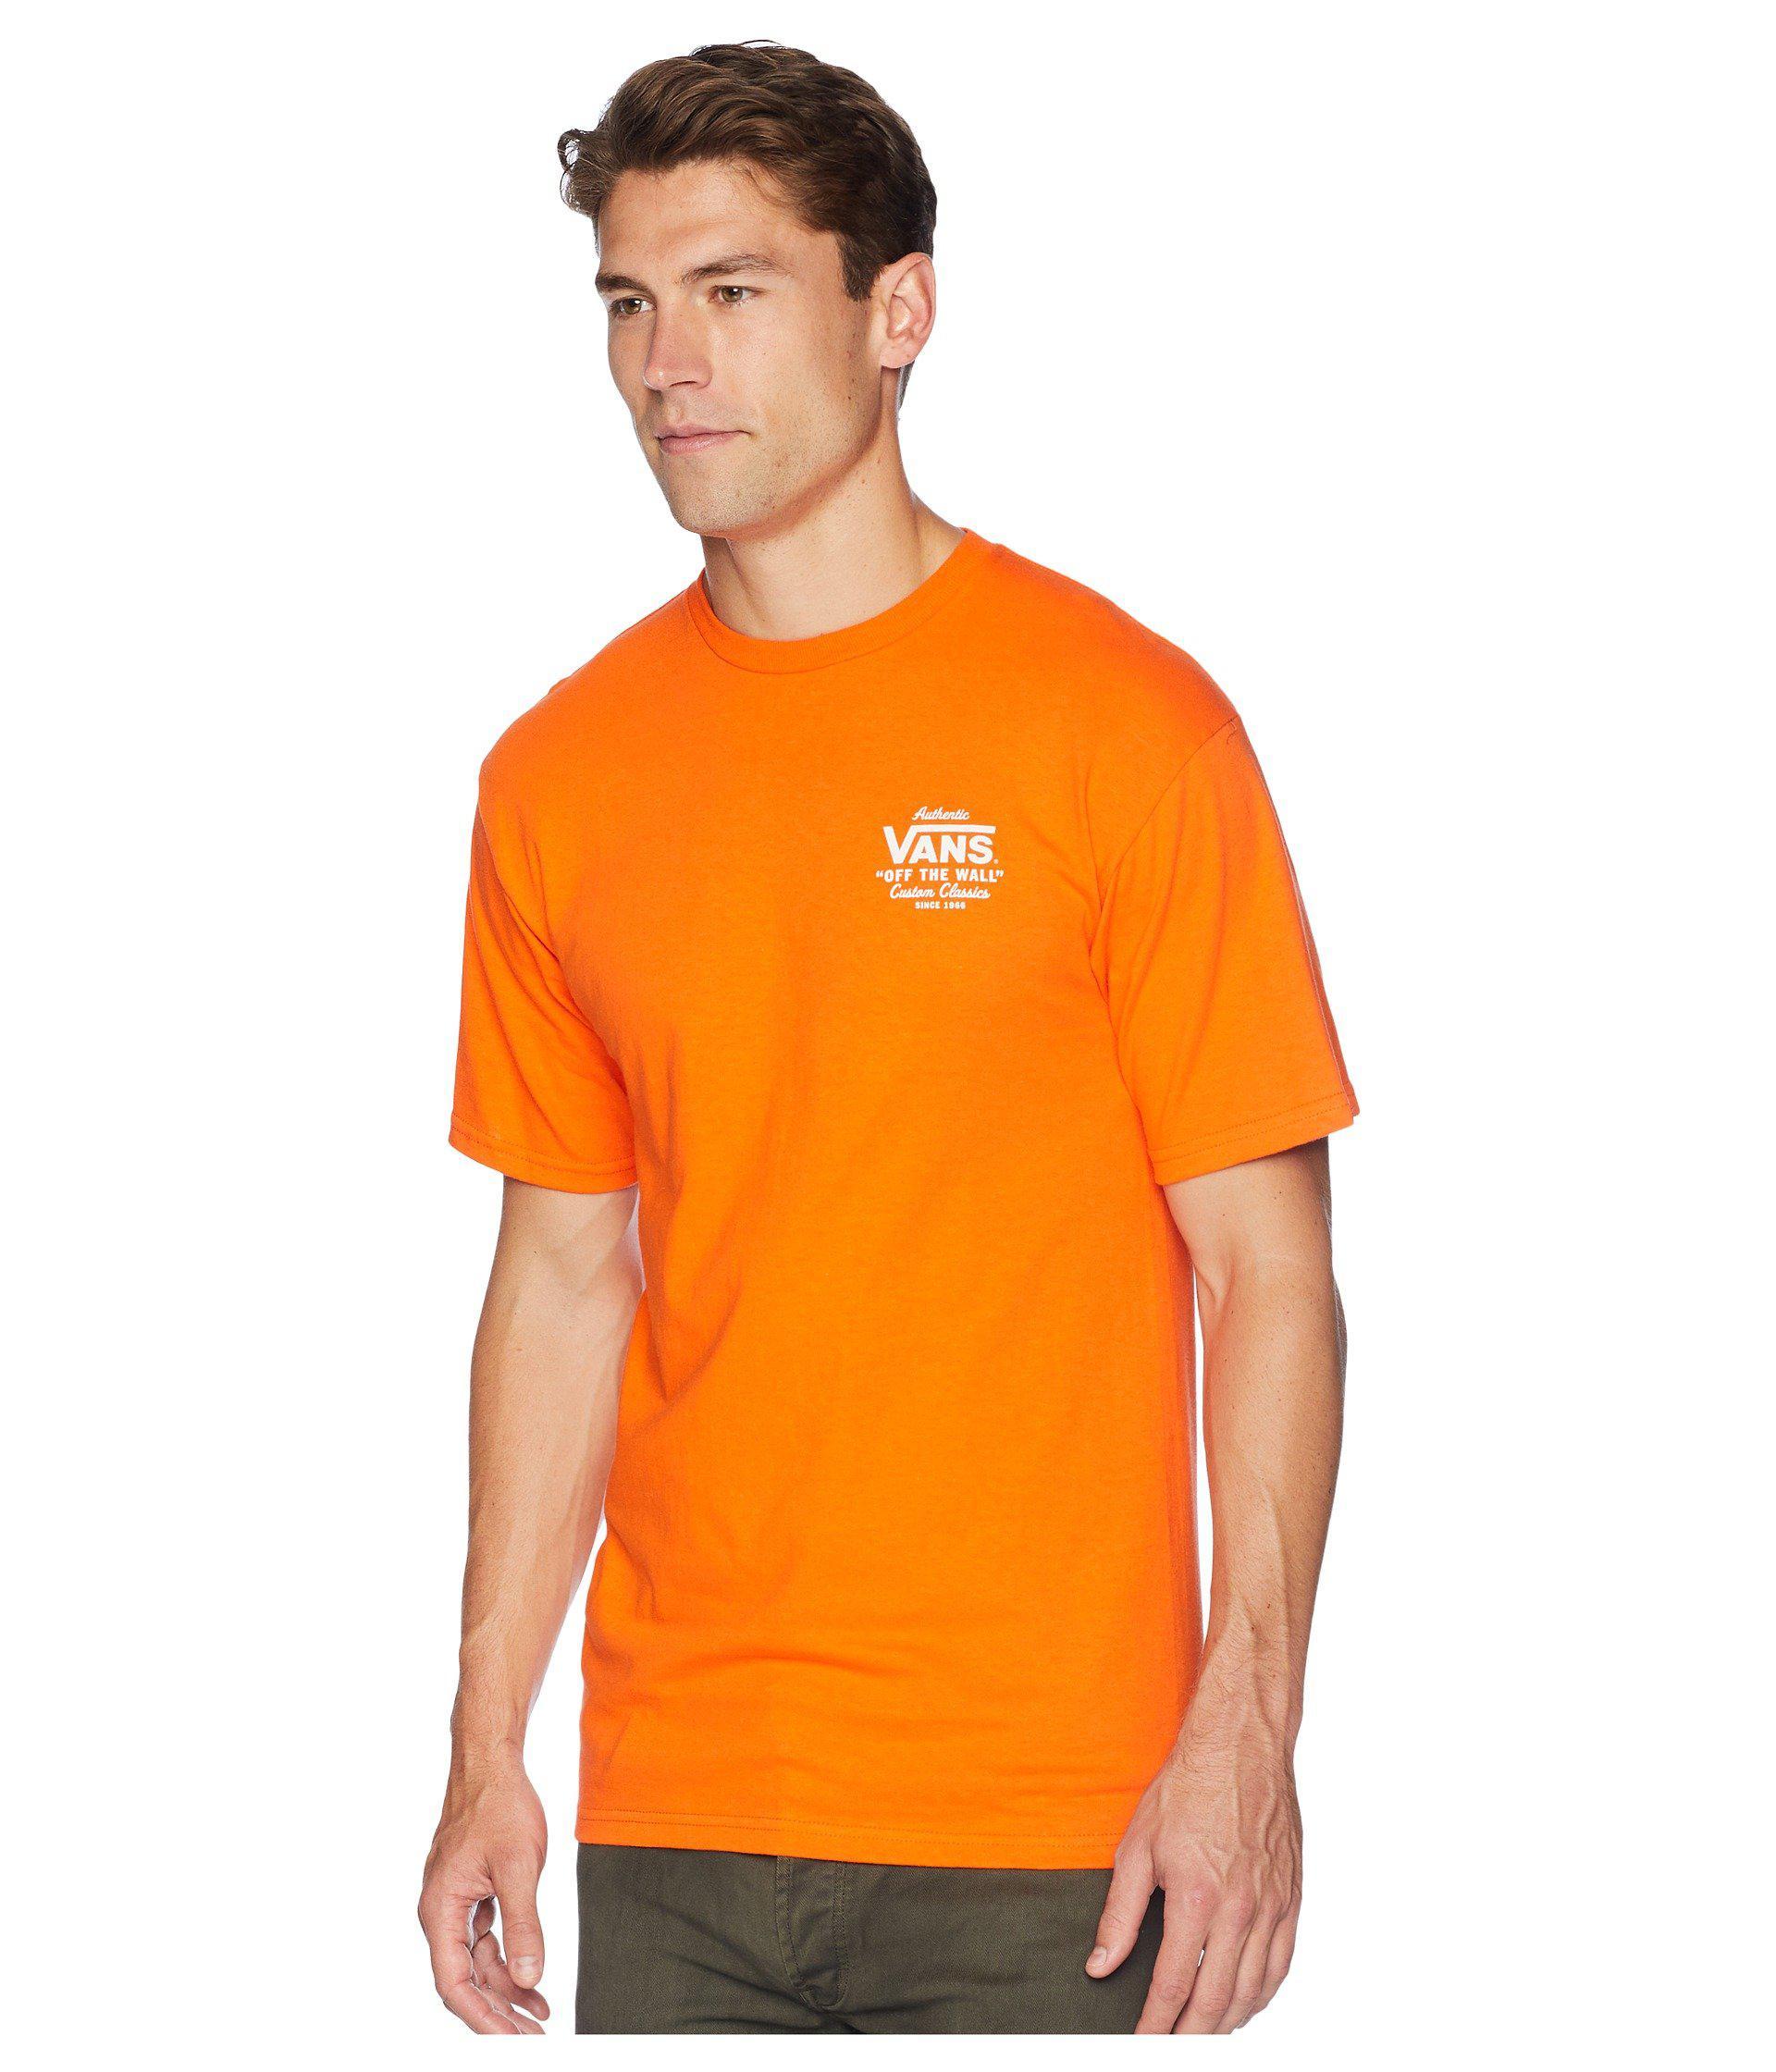 6258ea7c3dea46 Lyst - Vans Holder St Classic T-shirt in Orange for Men - Save 23%